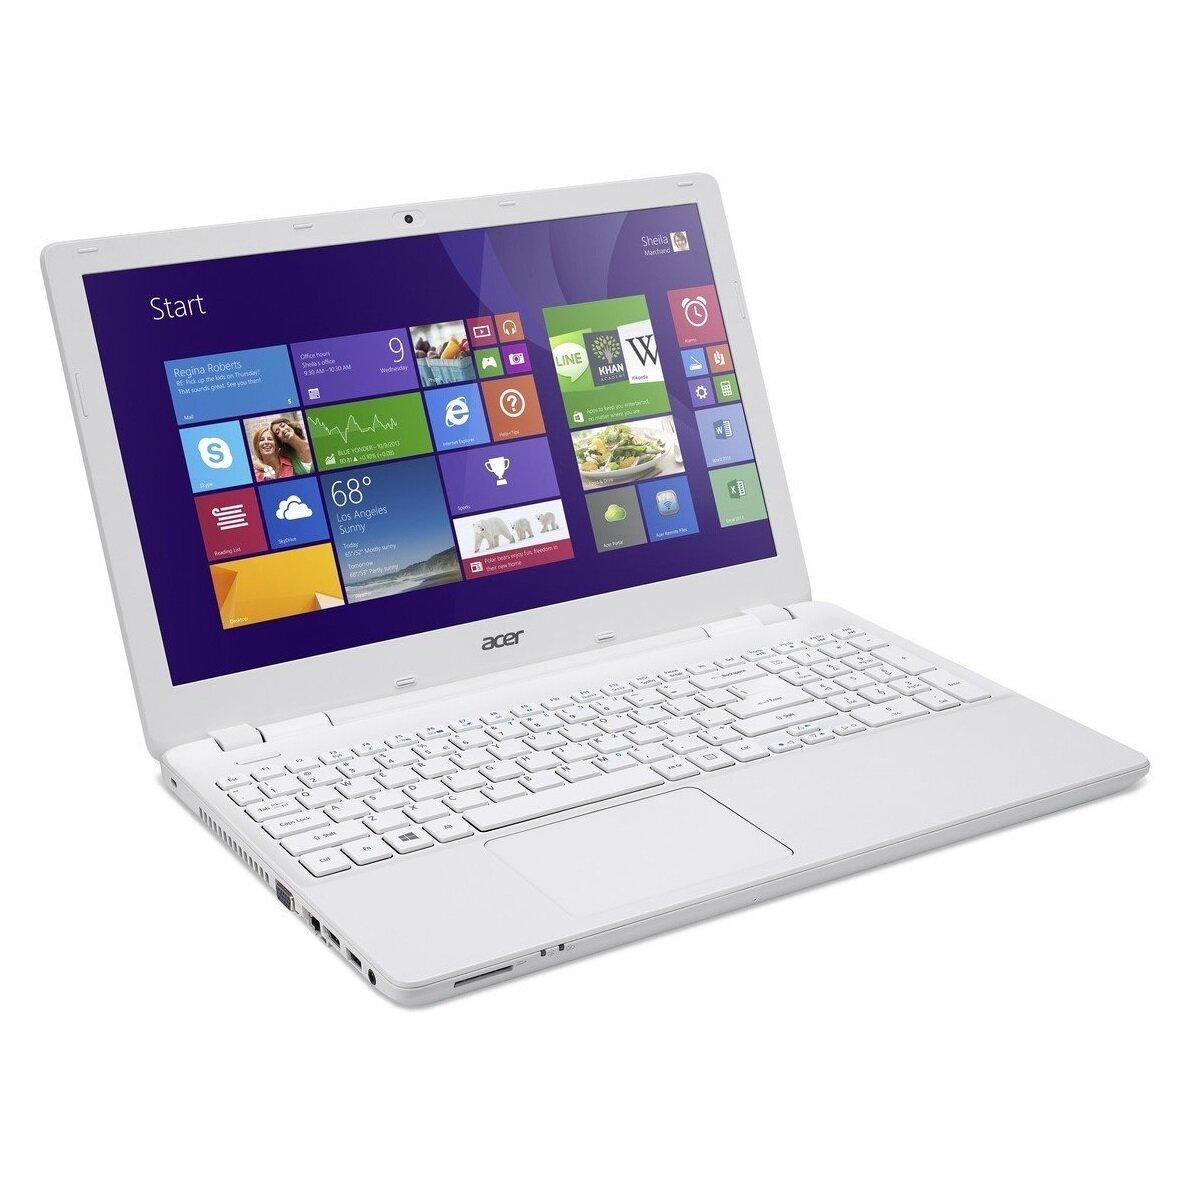 Máy tính xách tay Acer V3-572-52WG NX.MS9SV.001